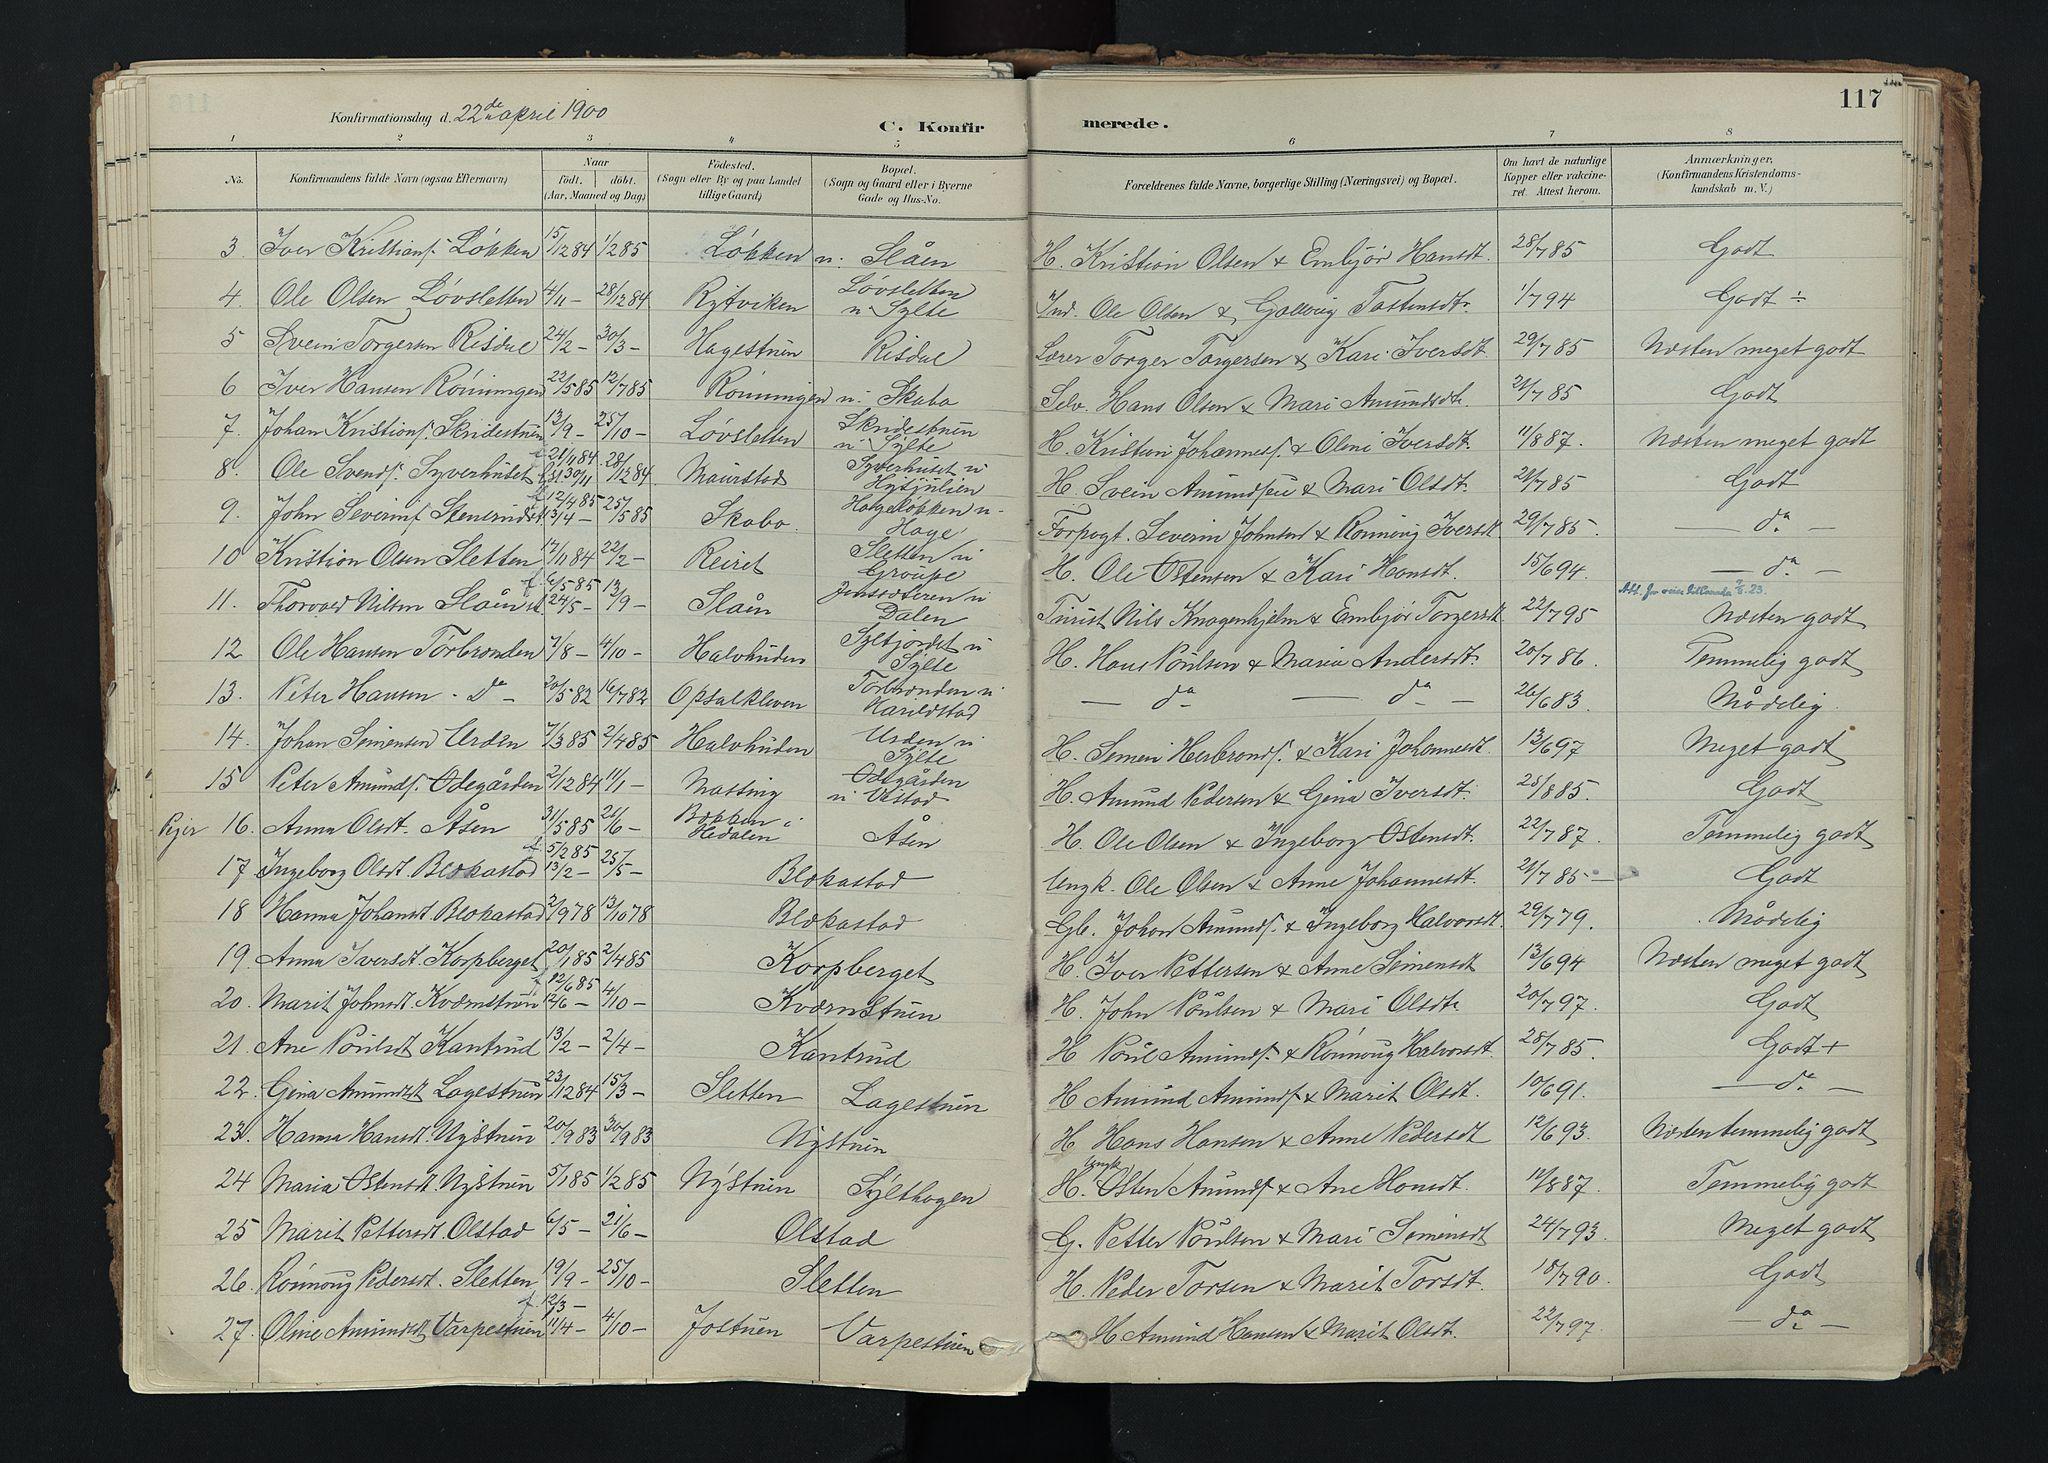 SAH, Nord-Fron prestekontor, Ministerialbok nr. 5, 1884-1914, s. 117